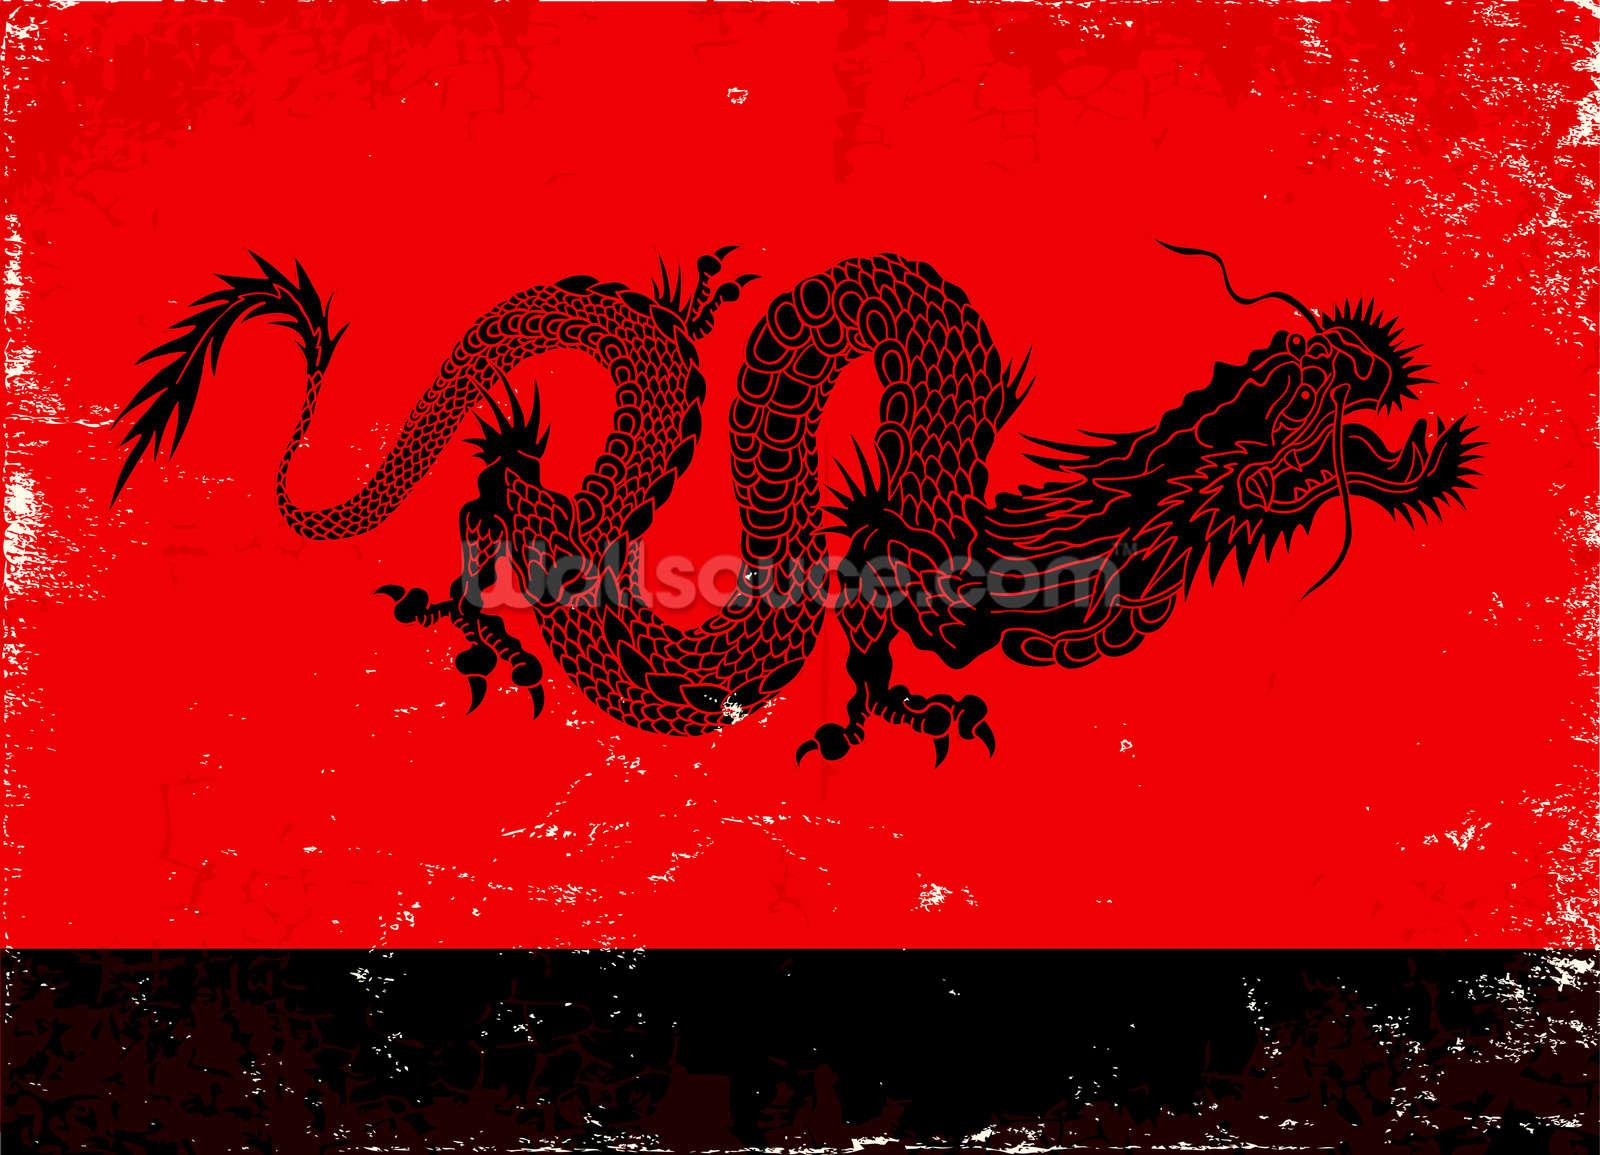 Black dragon wallpaper wall mural wallsauce for Dragon mural wallpaper